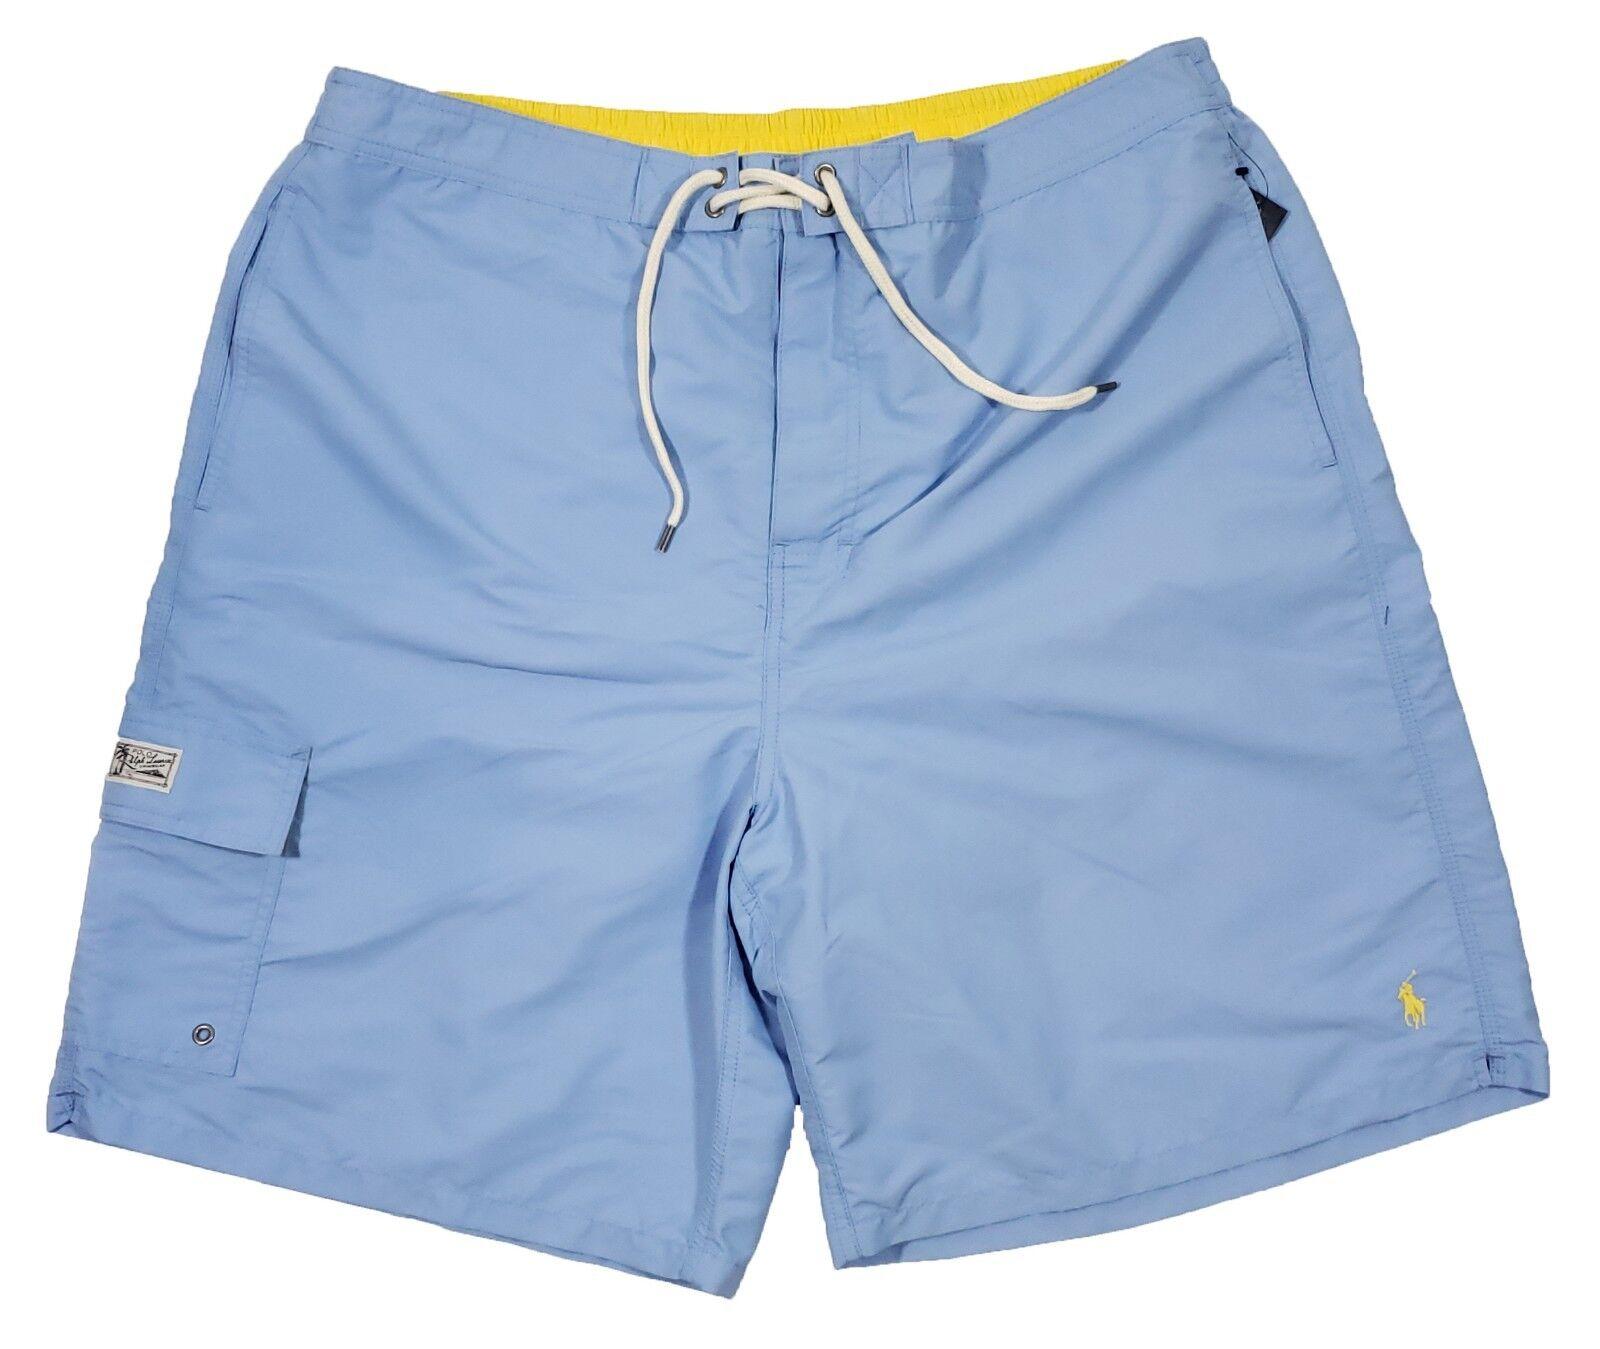 Polo Ralph Lauren Big & Tall Men's bluee Solid Swim Trunks